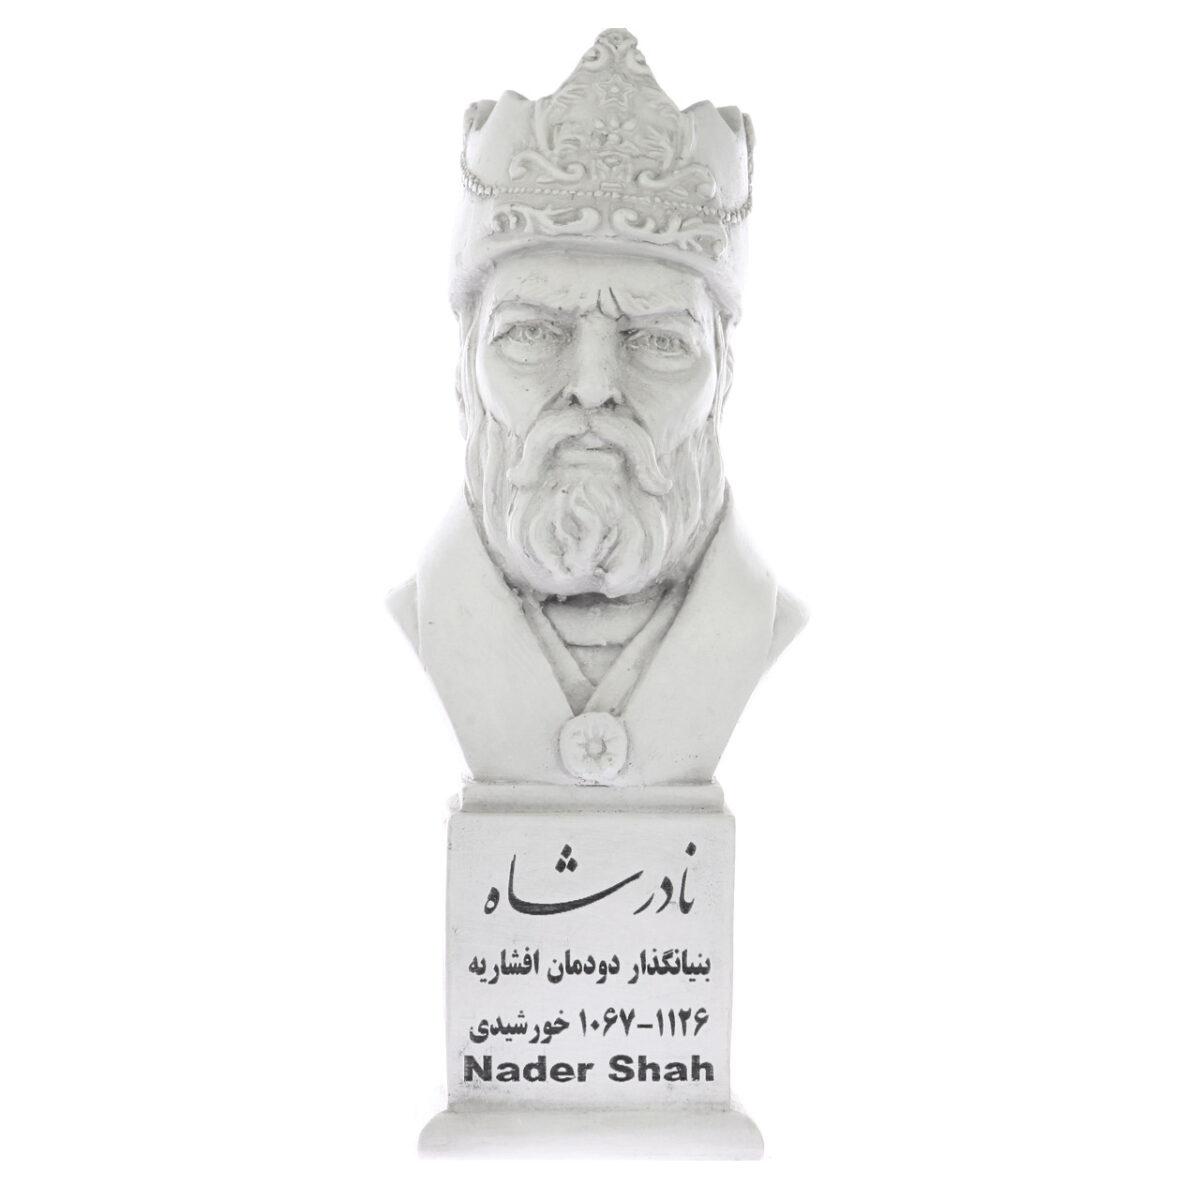 nader shah s 1200x1200 - سردیس نادر شاه افشار